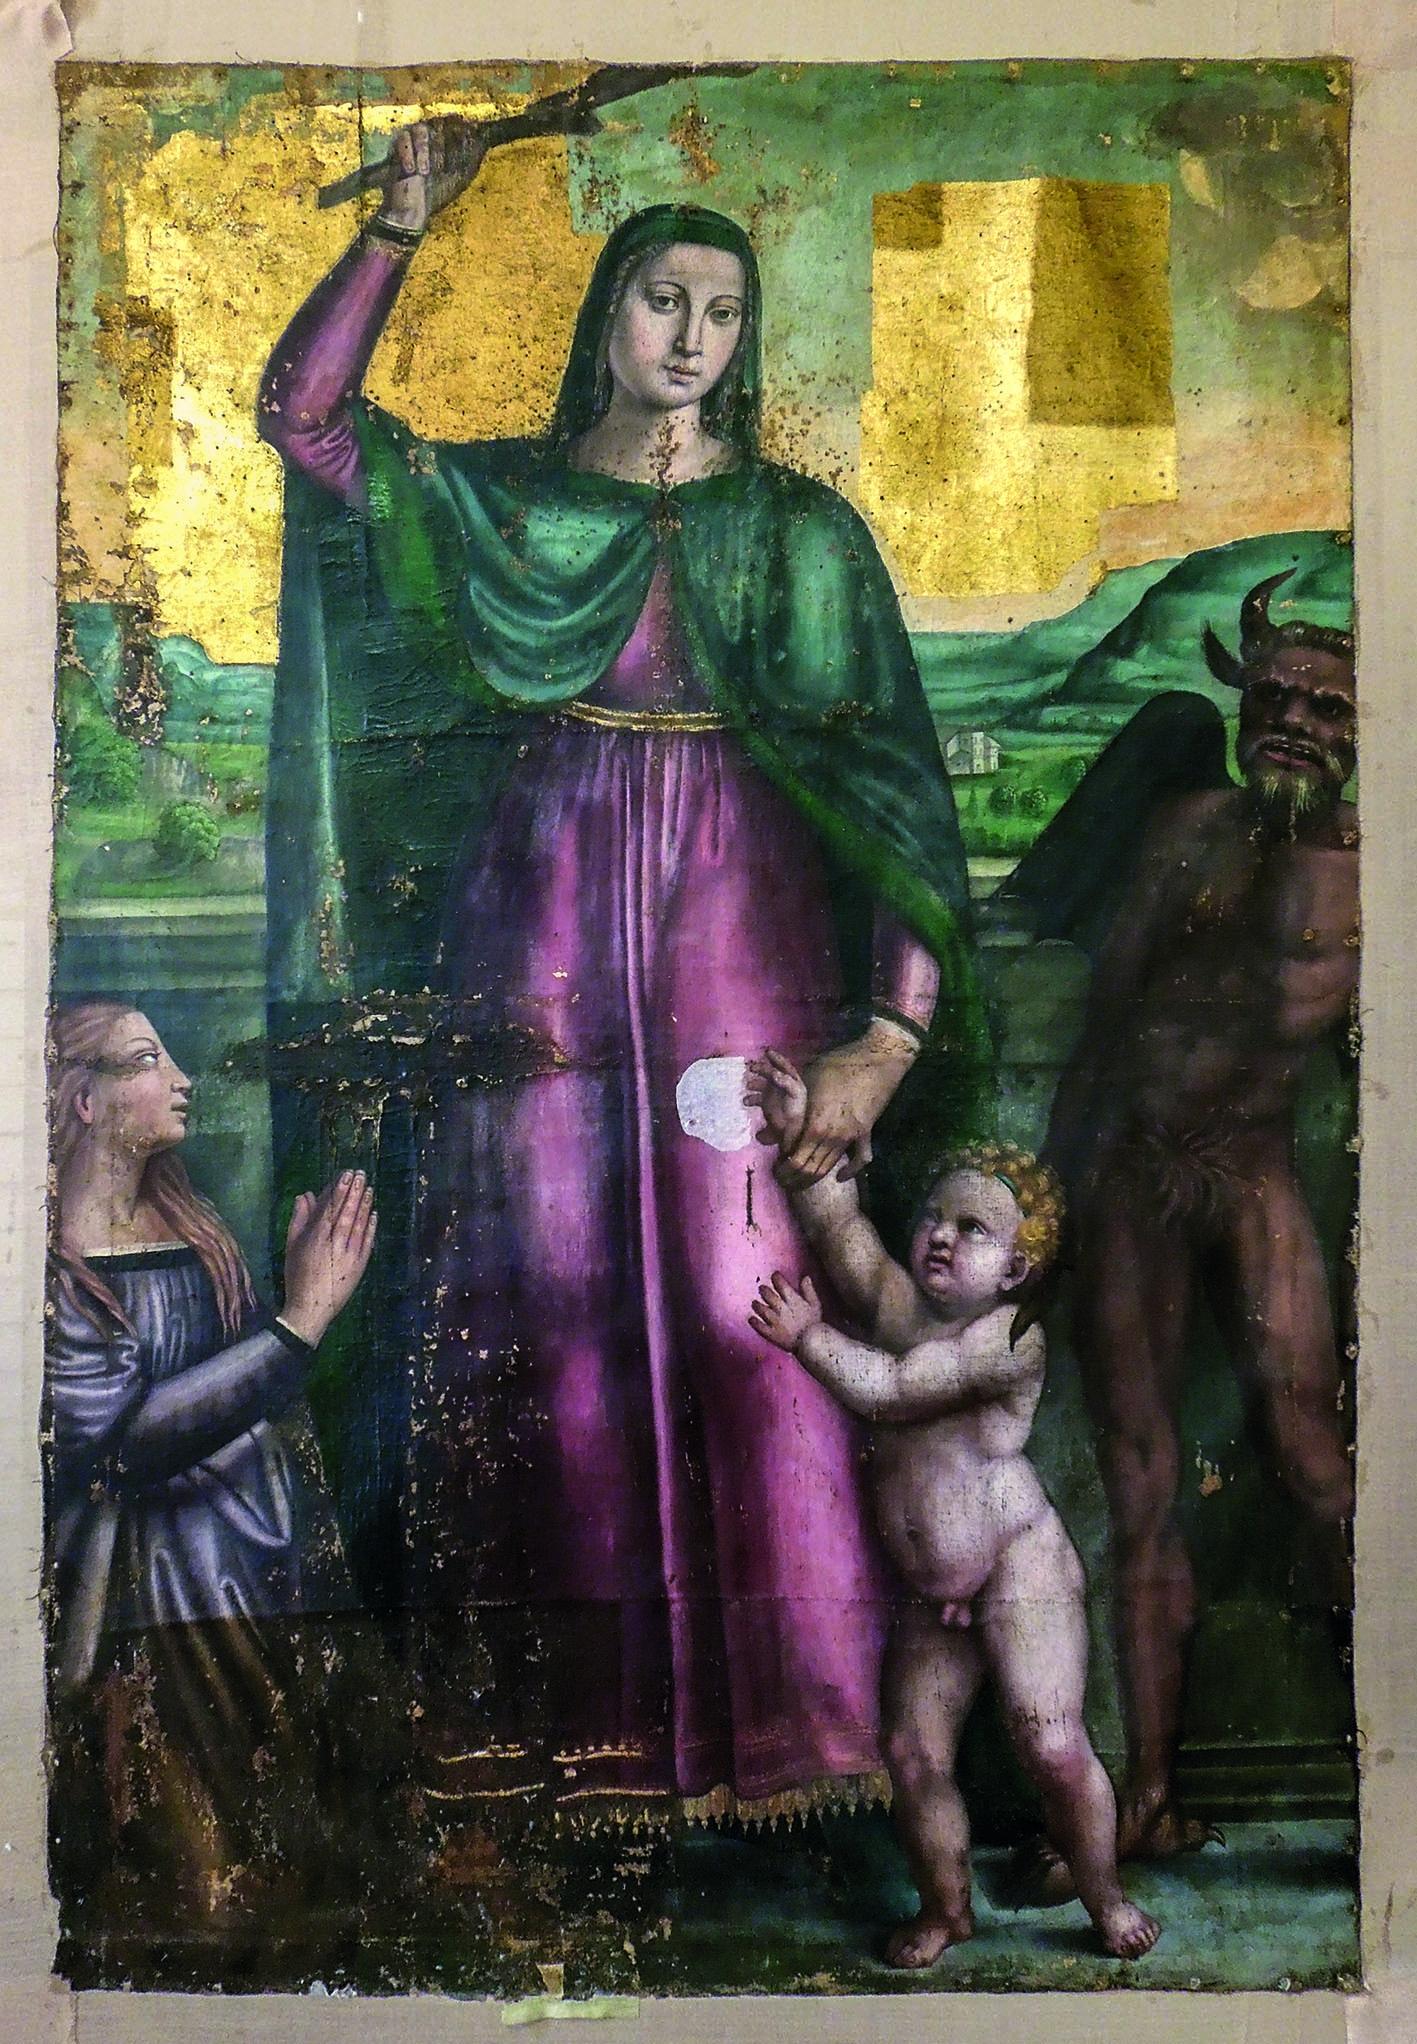 Una nuova mostra a Monte San Savino, protagonista Niccolò Soggi